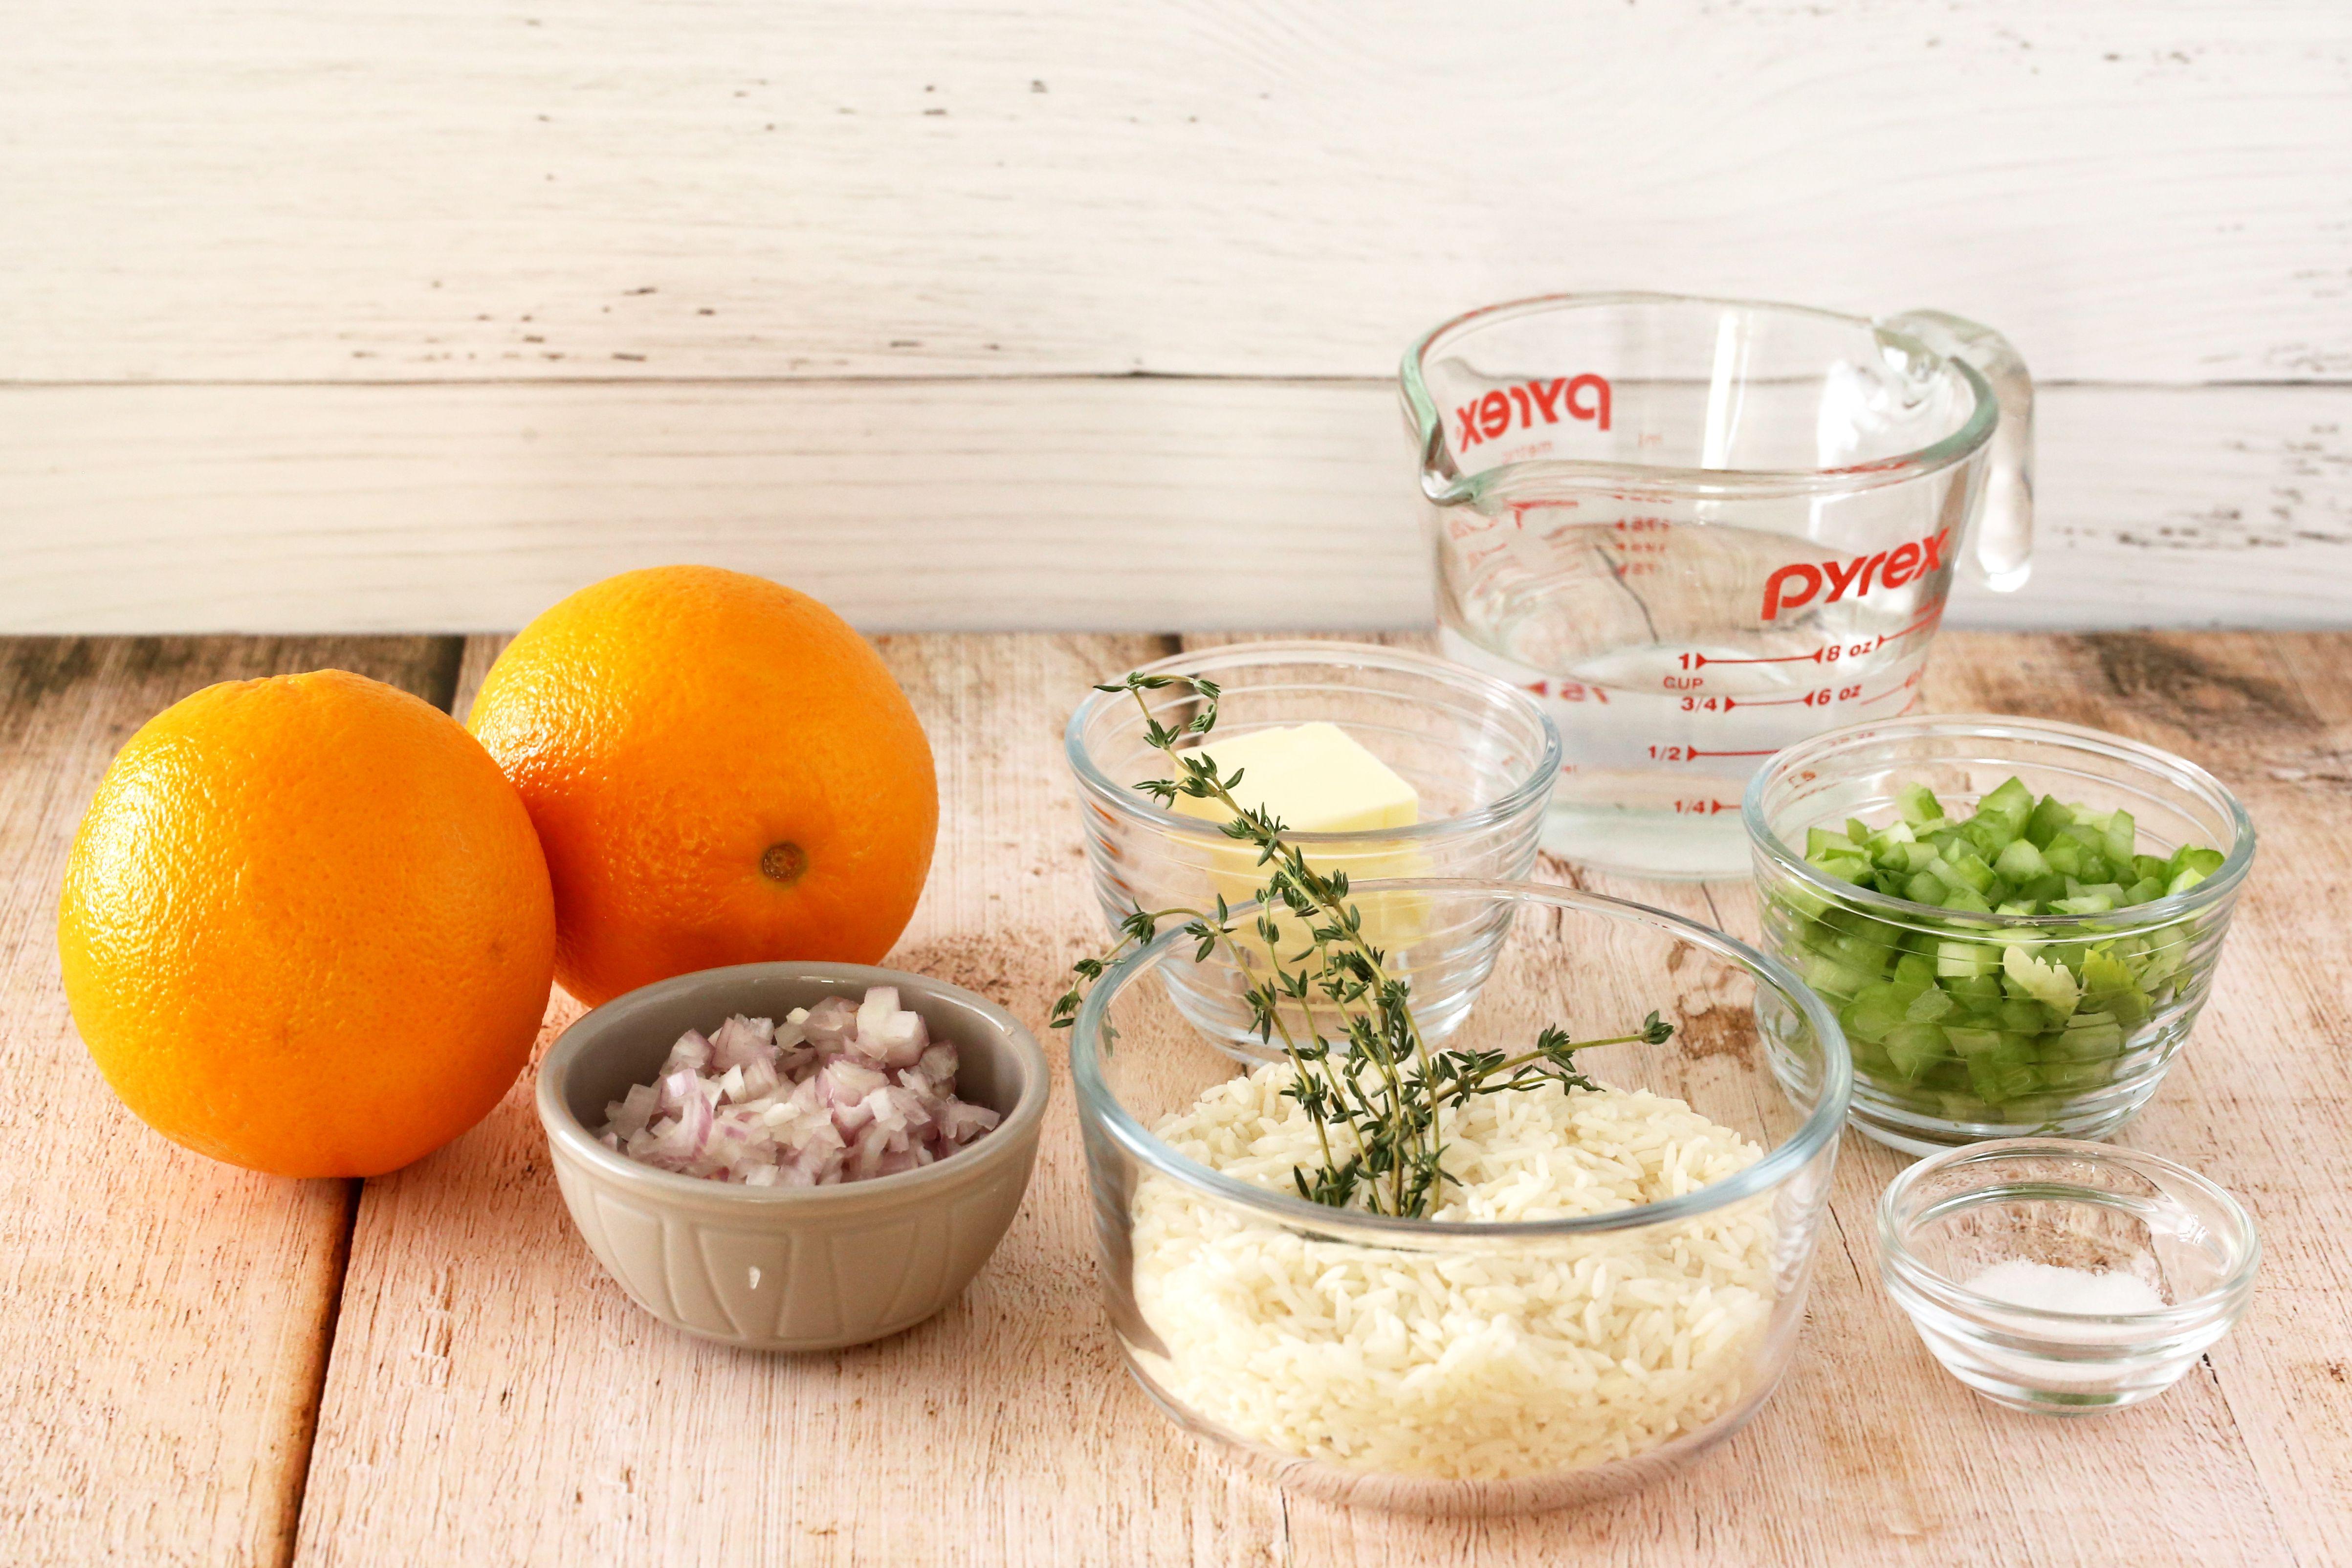 Ingredients for easy orange rice recipe